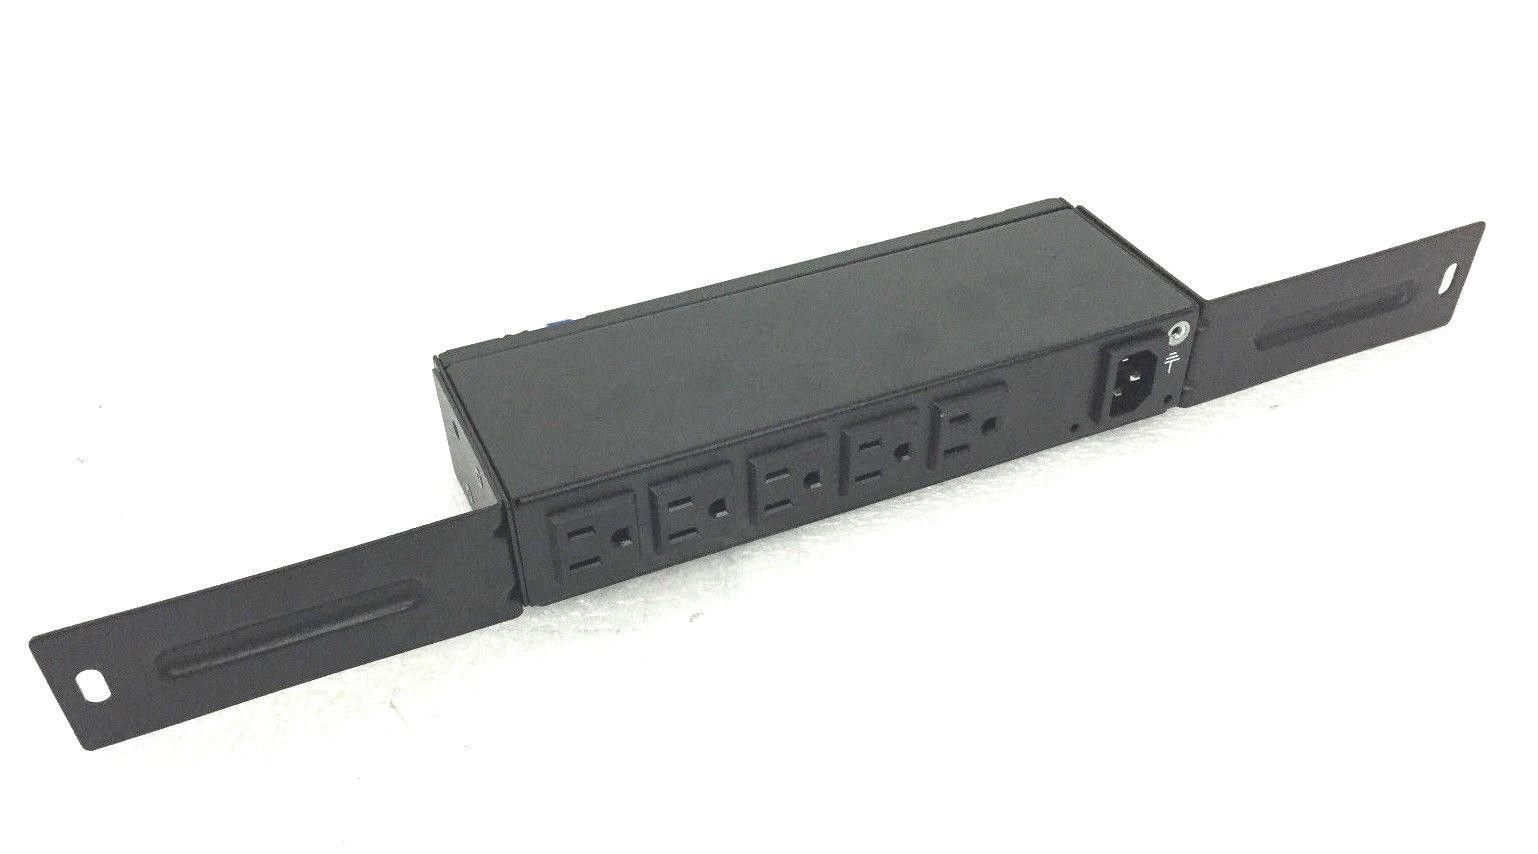 Dell 5-Port Power Distribution Unit For Dell Rack Rackmoutable (G761N)